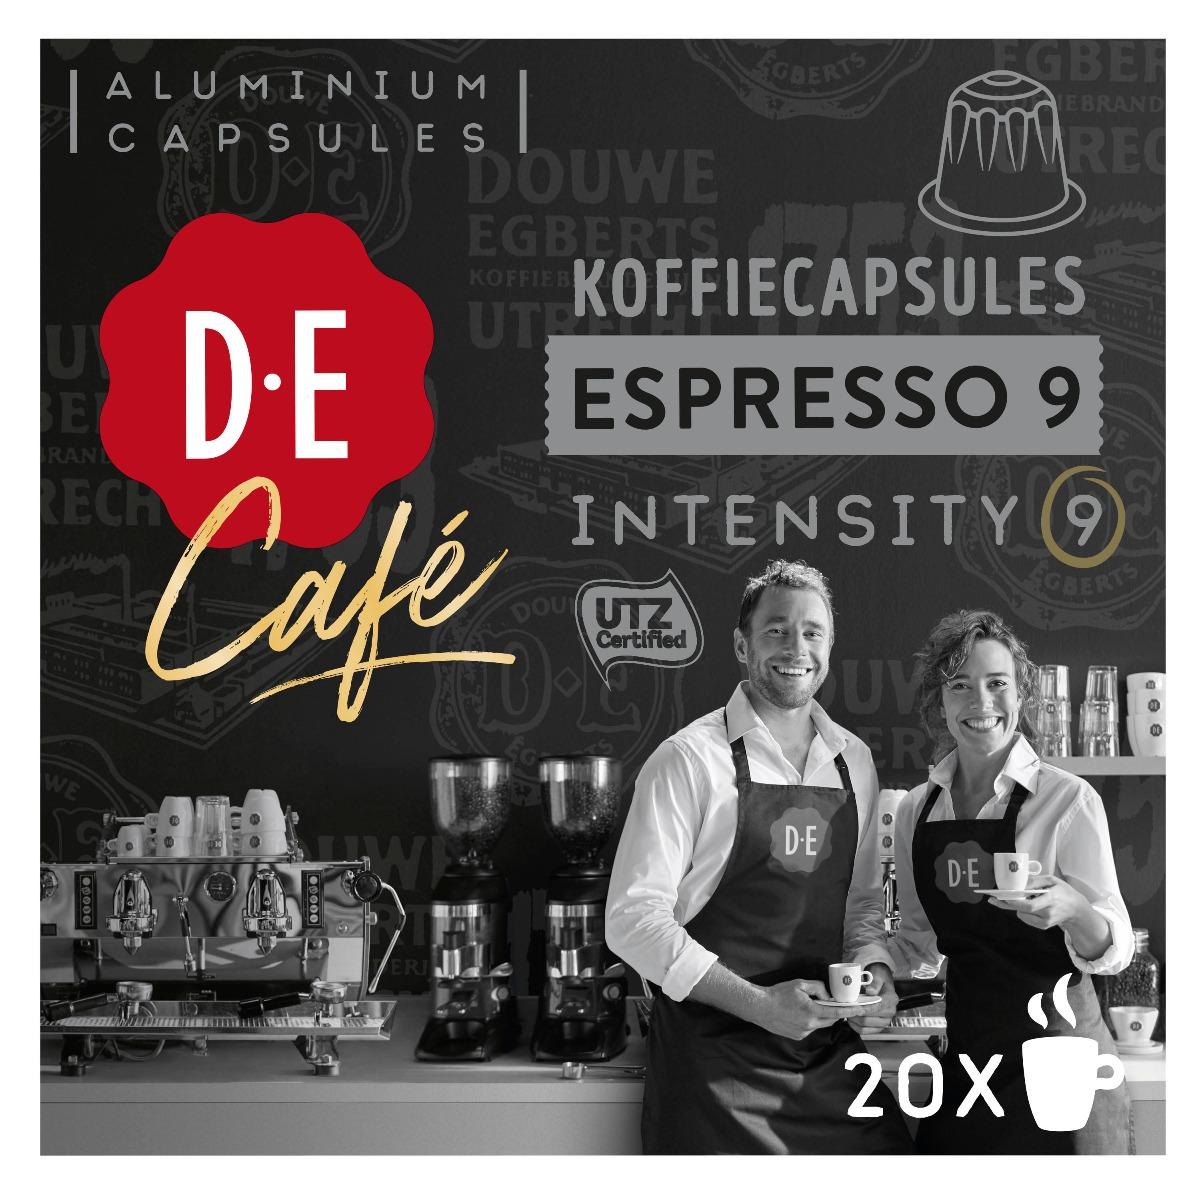 Douwe Egberts D.E Café - koffiecups nespesso compatible - Espresso 9